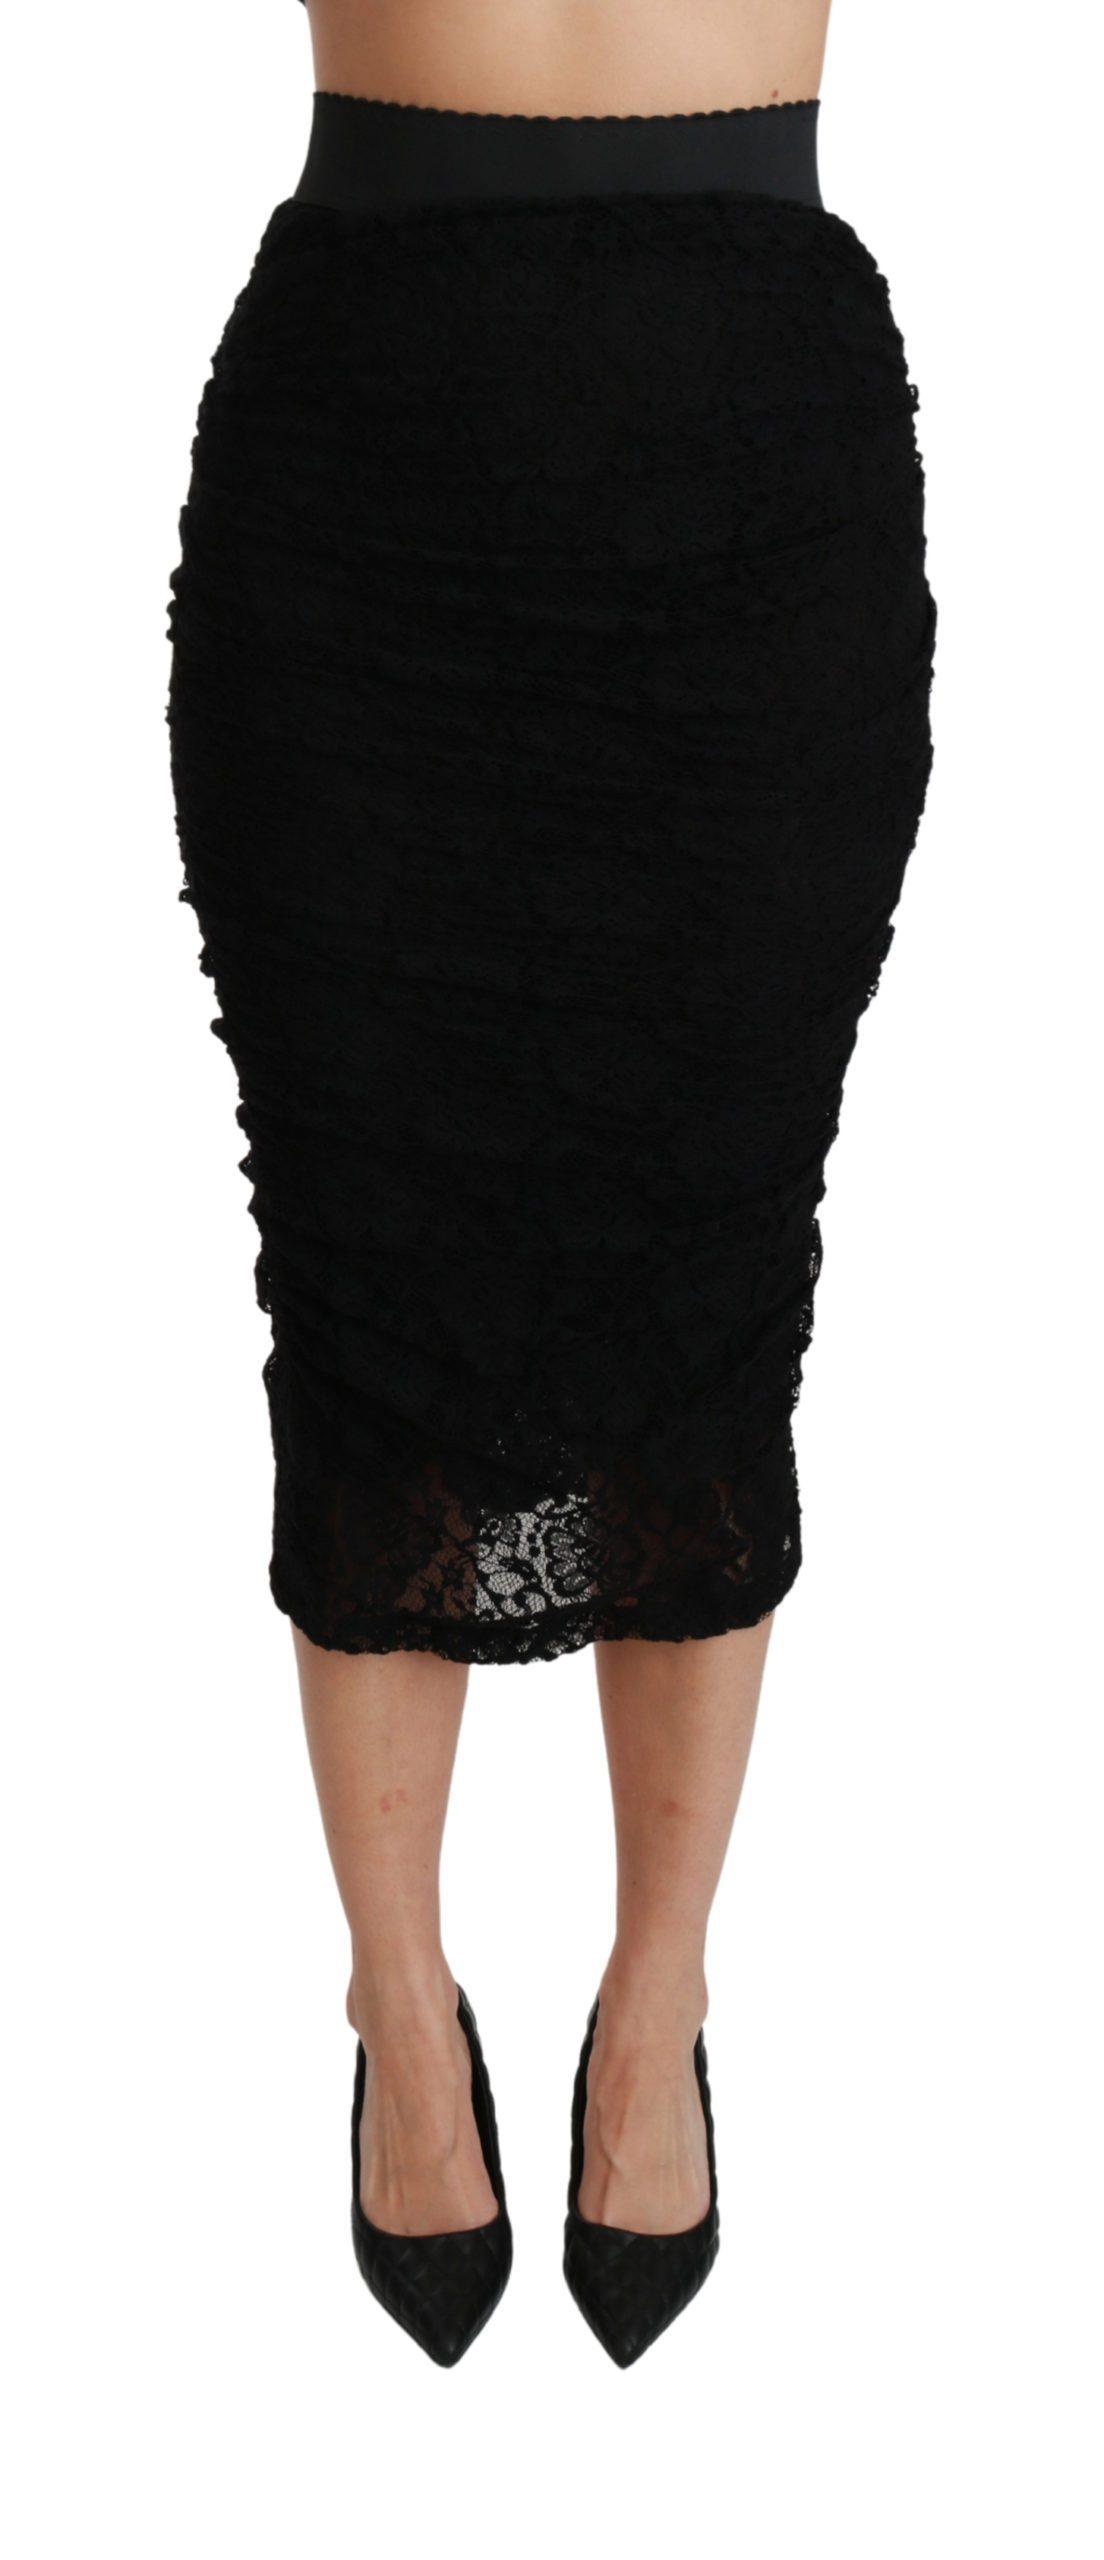 Dolce & Gabbana Women's Lace High Waist Pencil Cut Skirt Black SKI1406 - IT38|XS